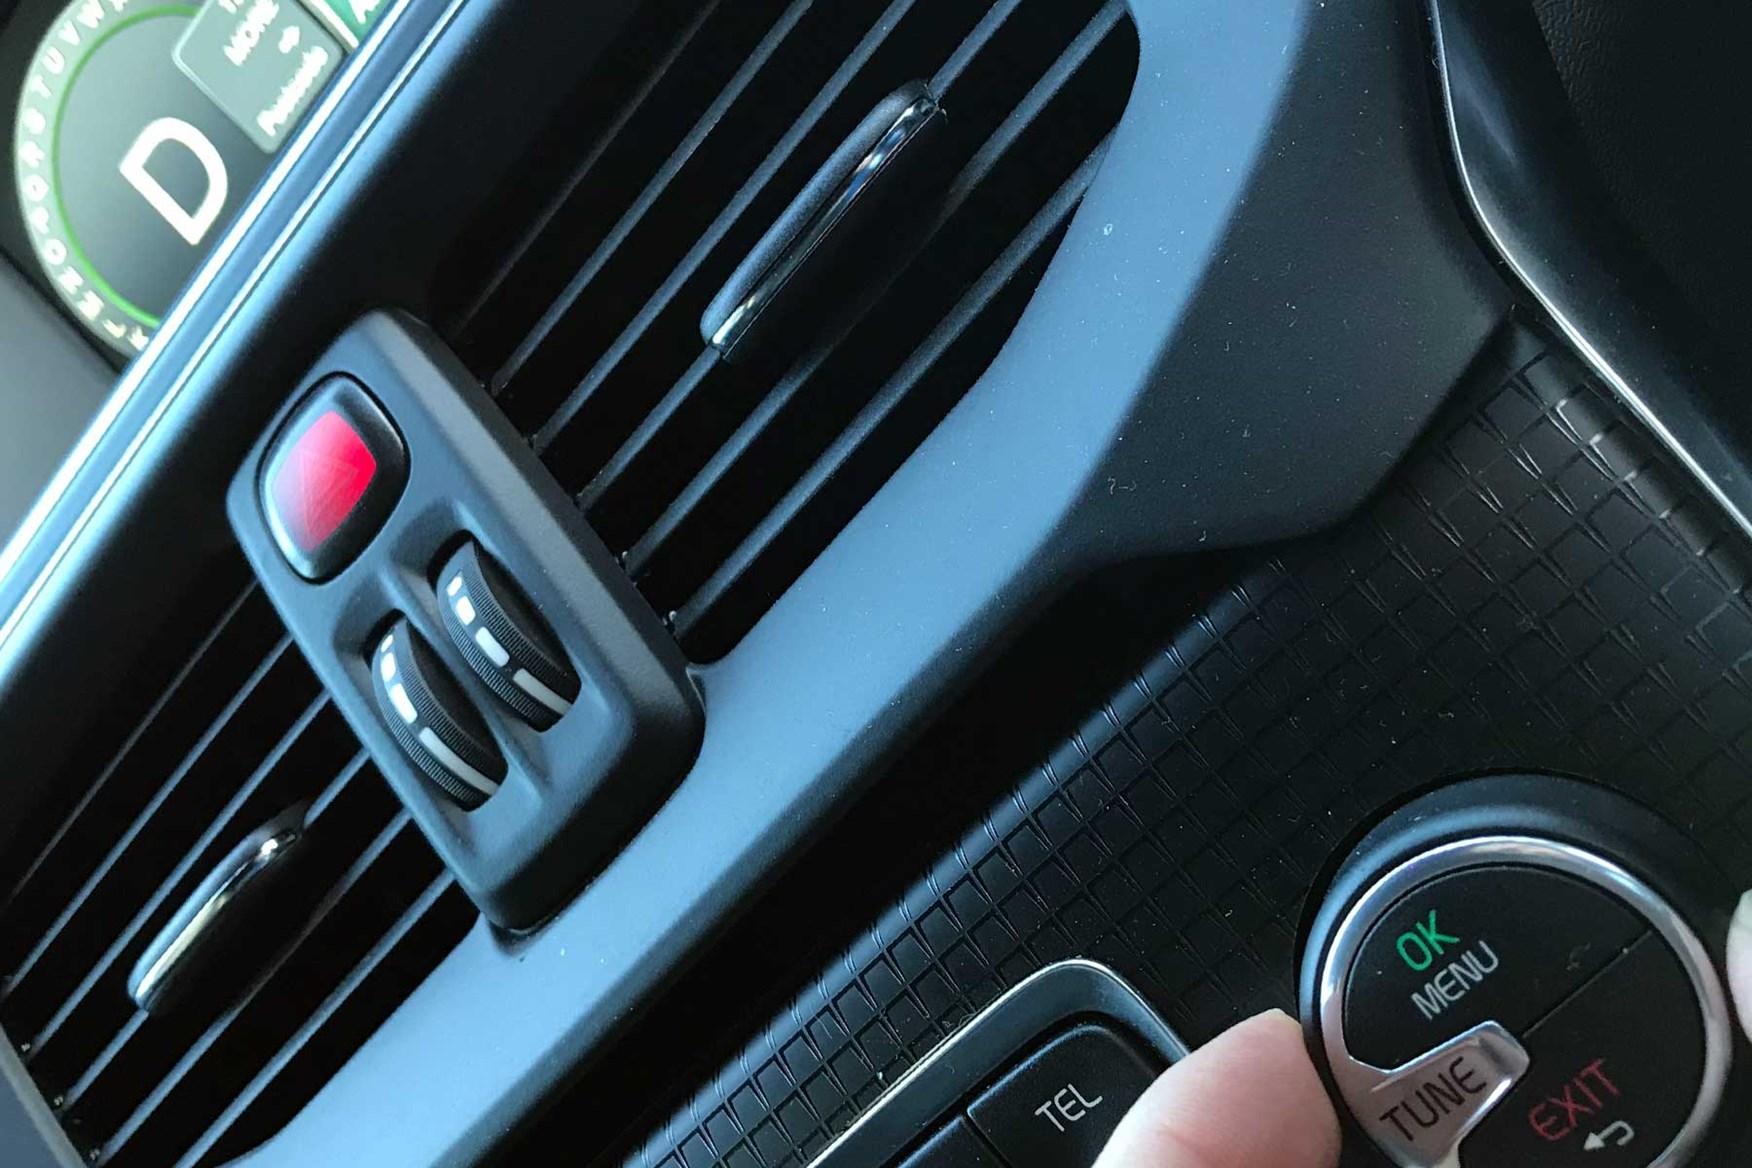 Volvo V40 sat-nav wheel control